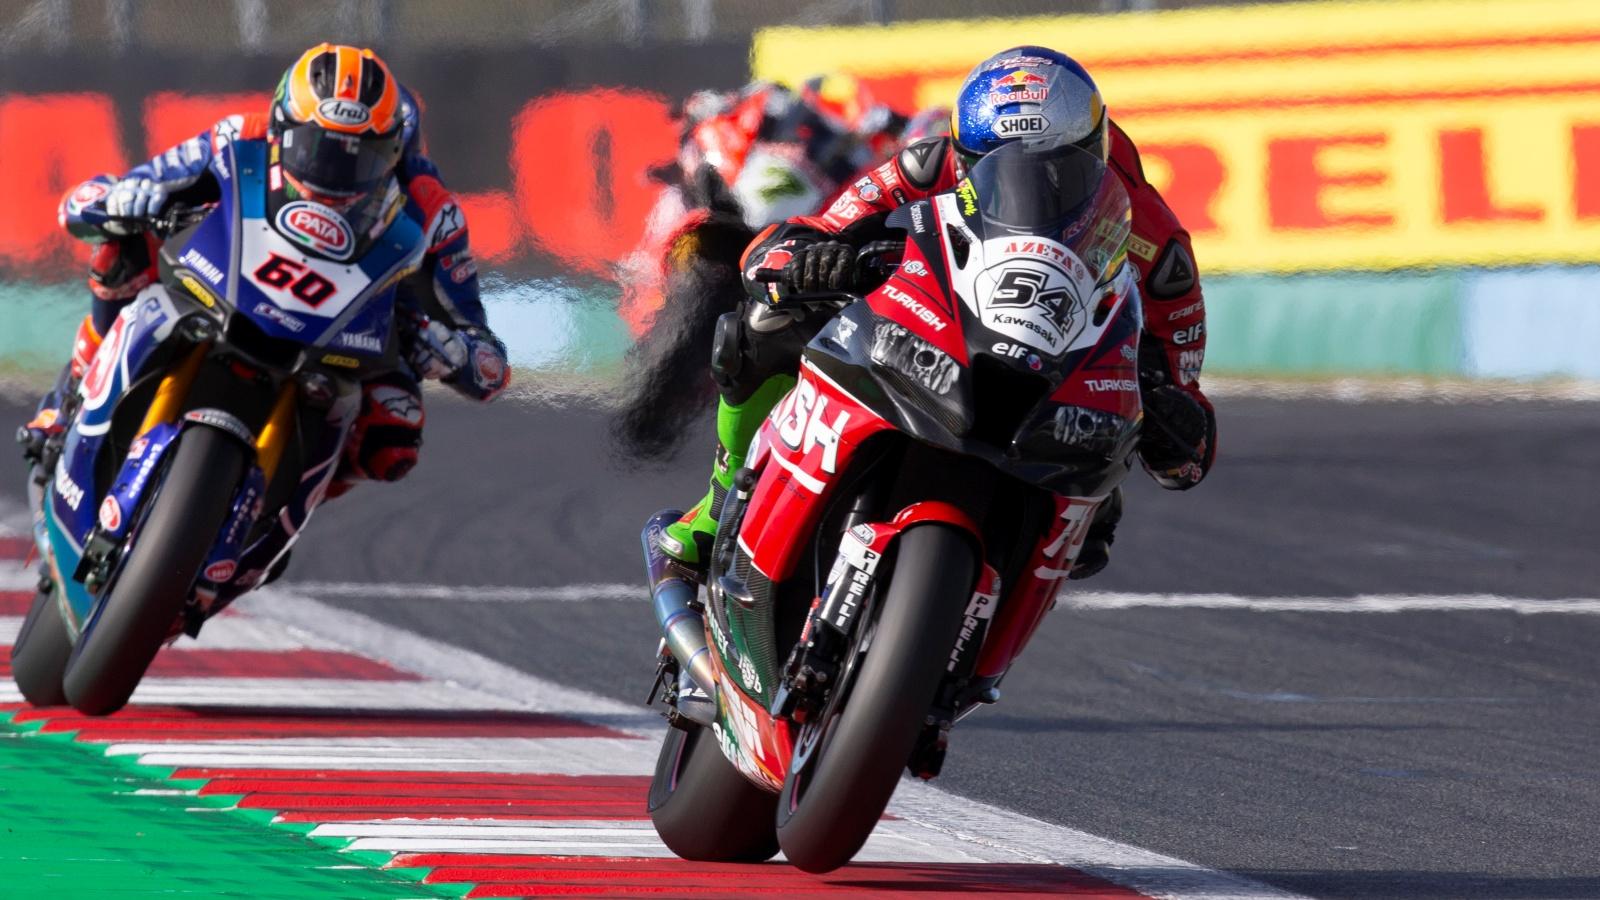 Toprak Razgatlioglu ficha por Yamaha para el Mundial de Superbike 2020